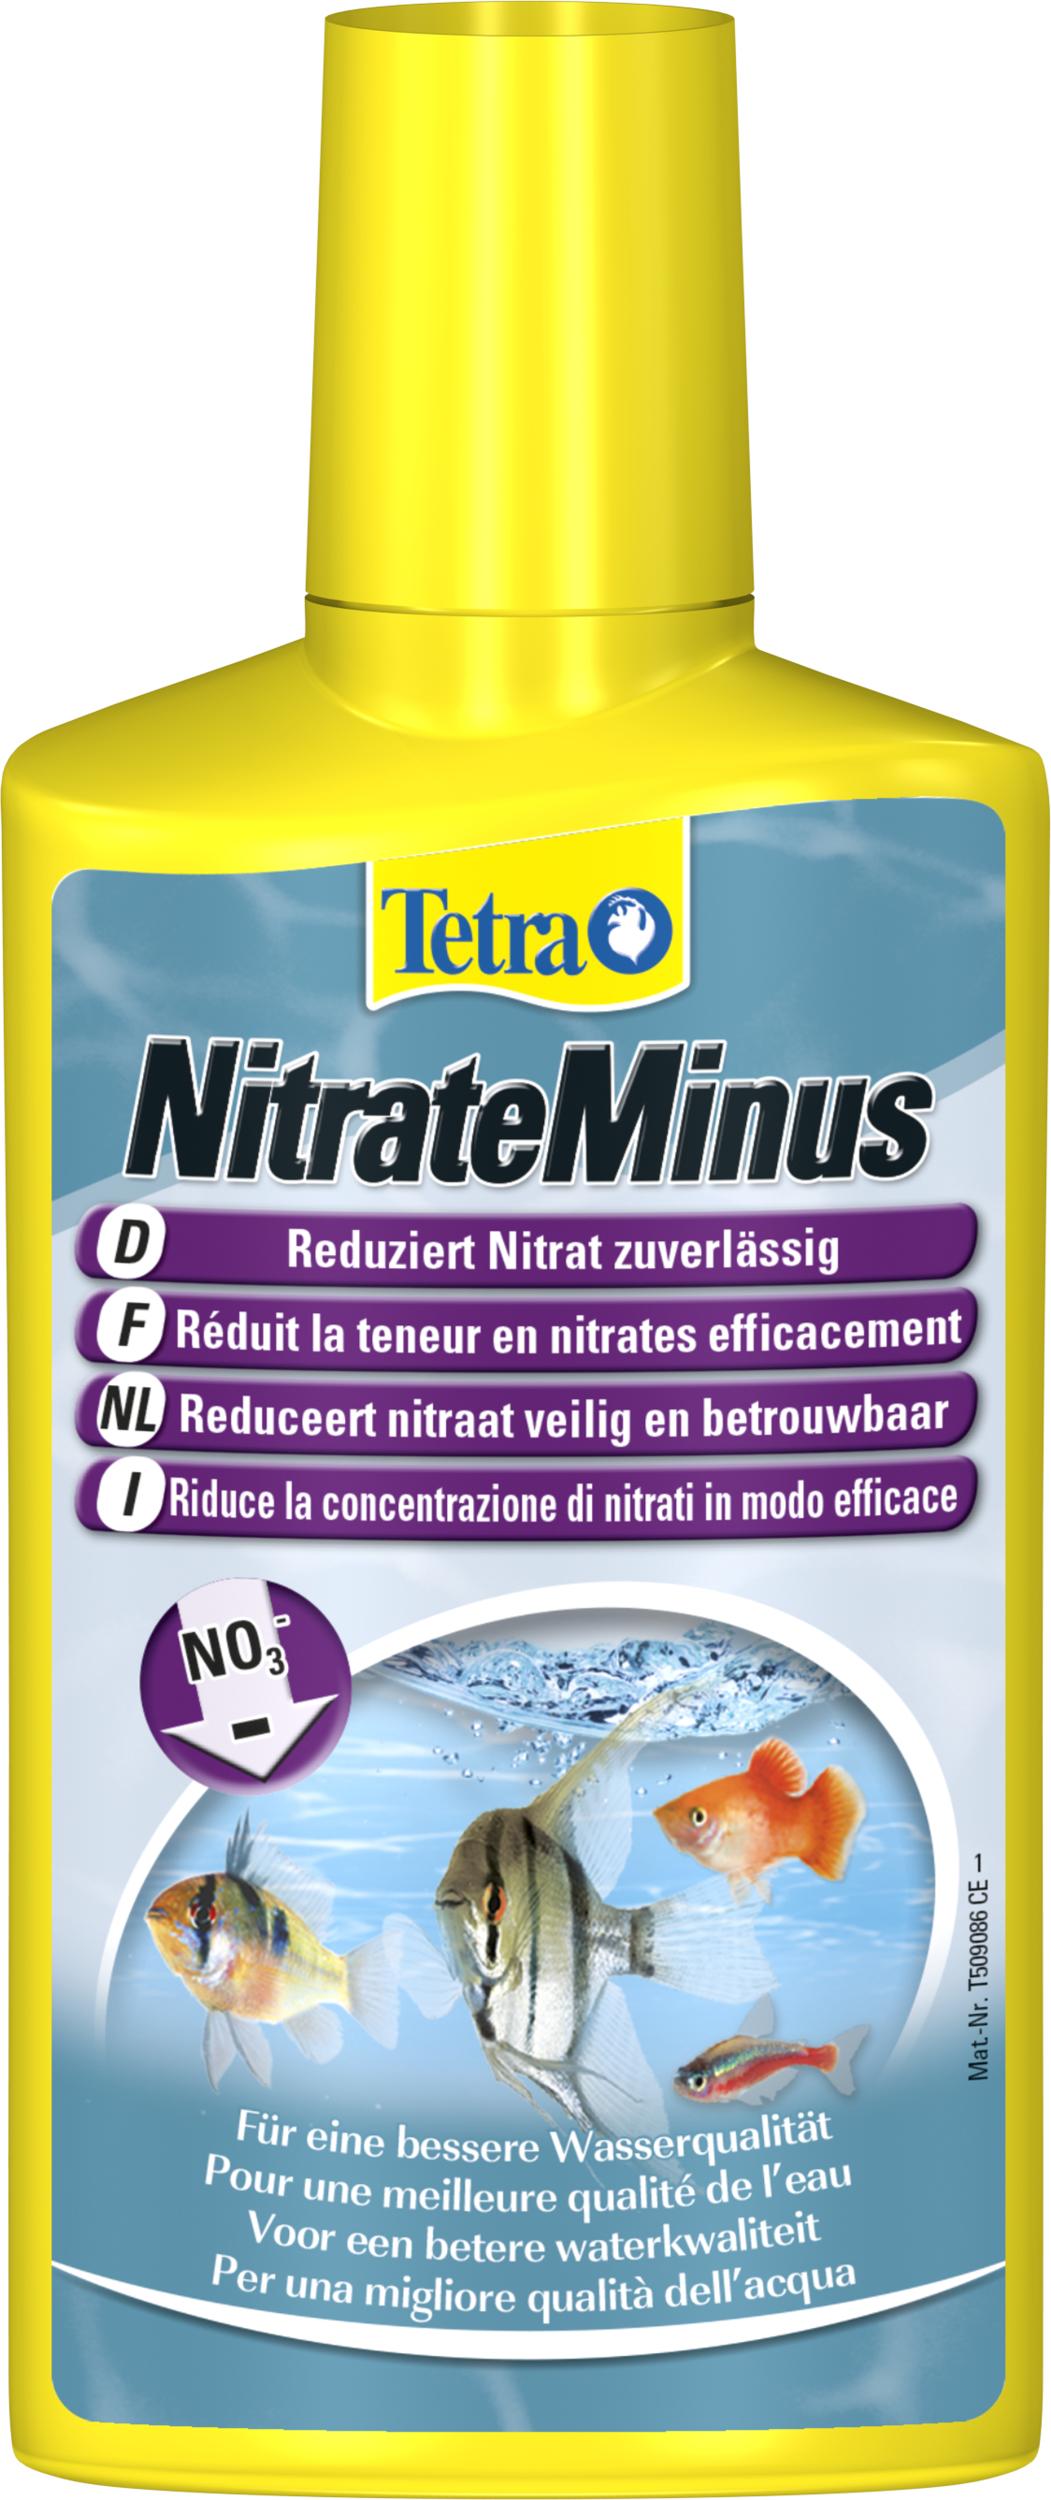 tetra-nitrate-minus-250-ml